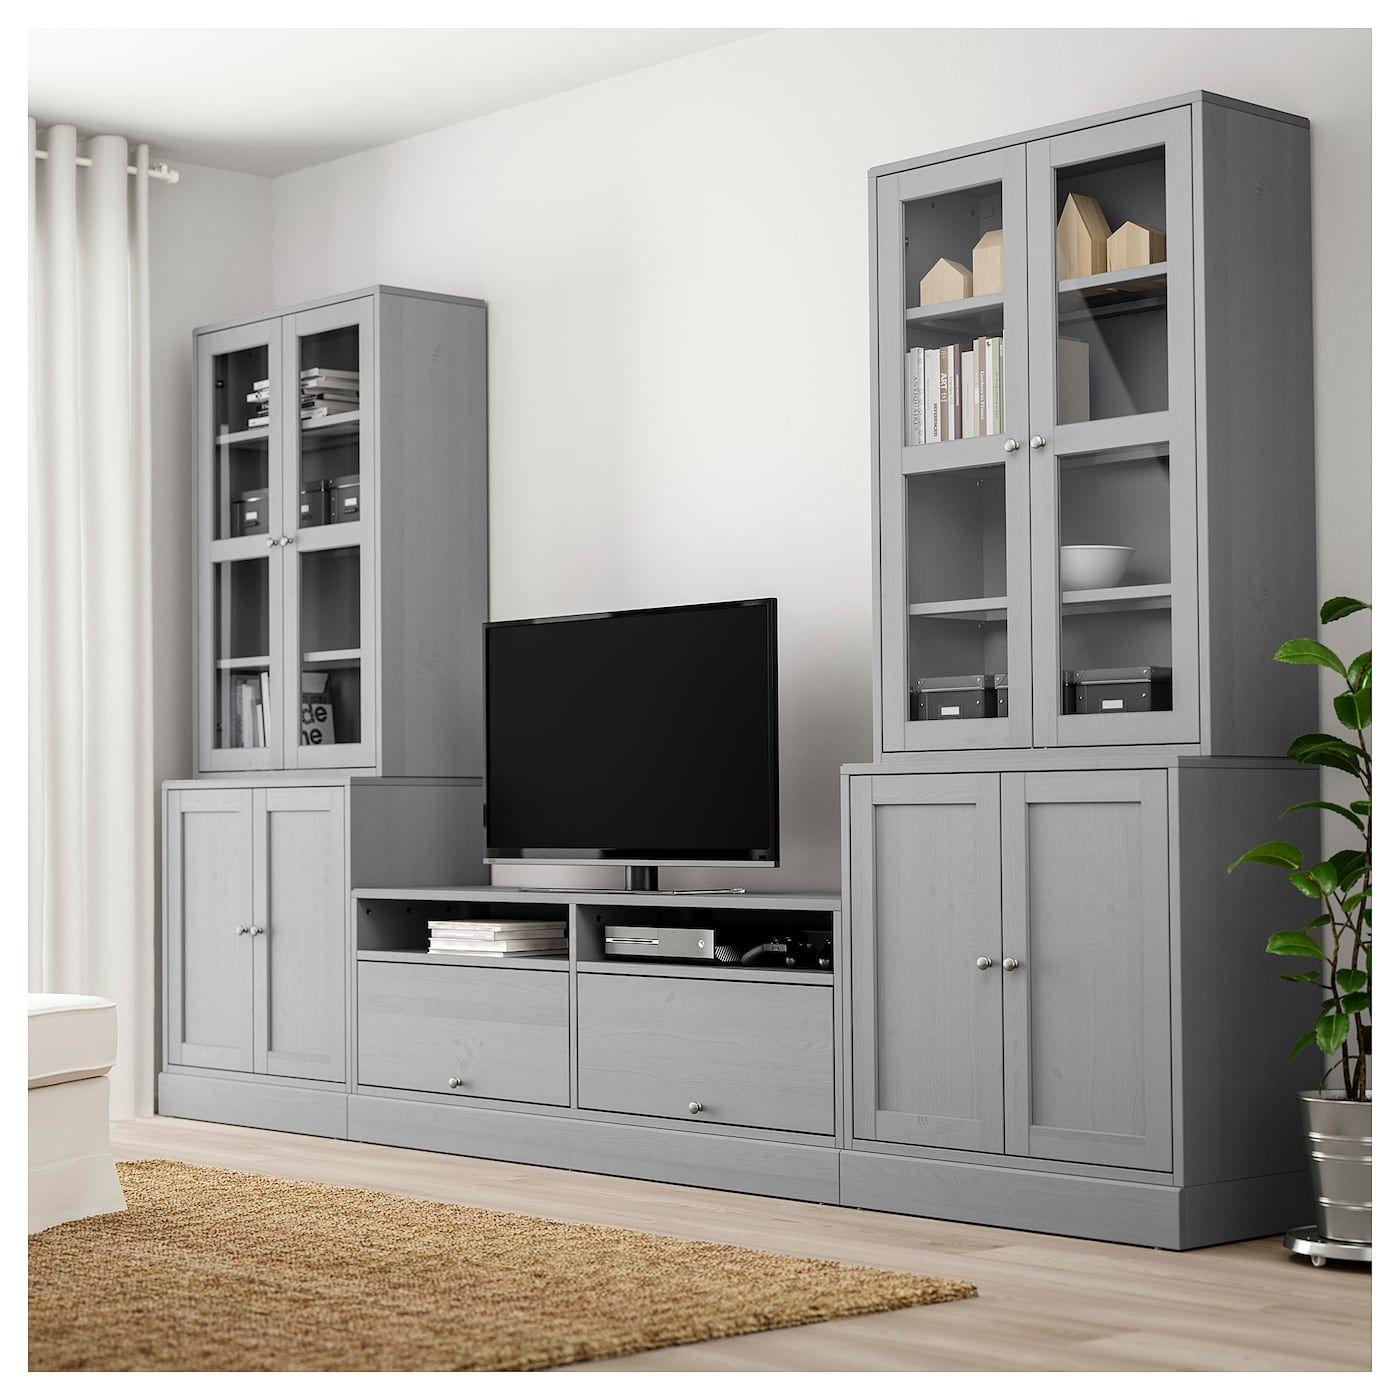 IKEA US - Furniture and Home Furnishings | Tv storage ...